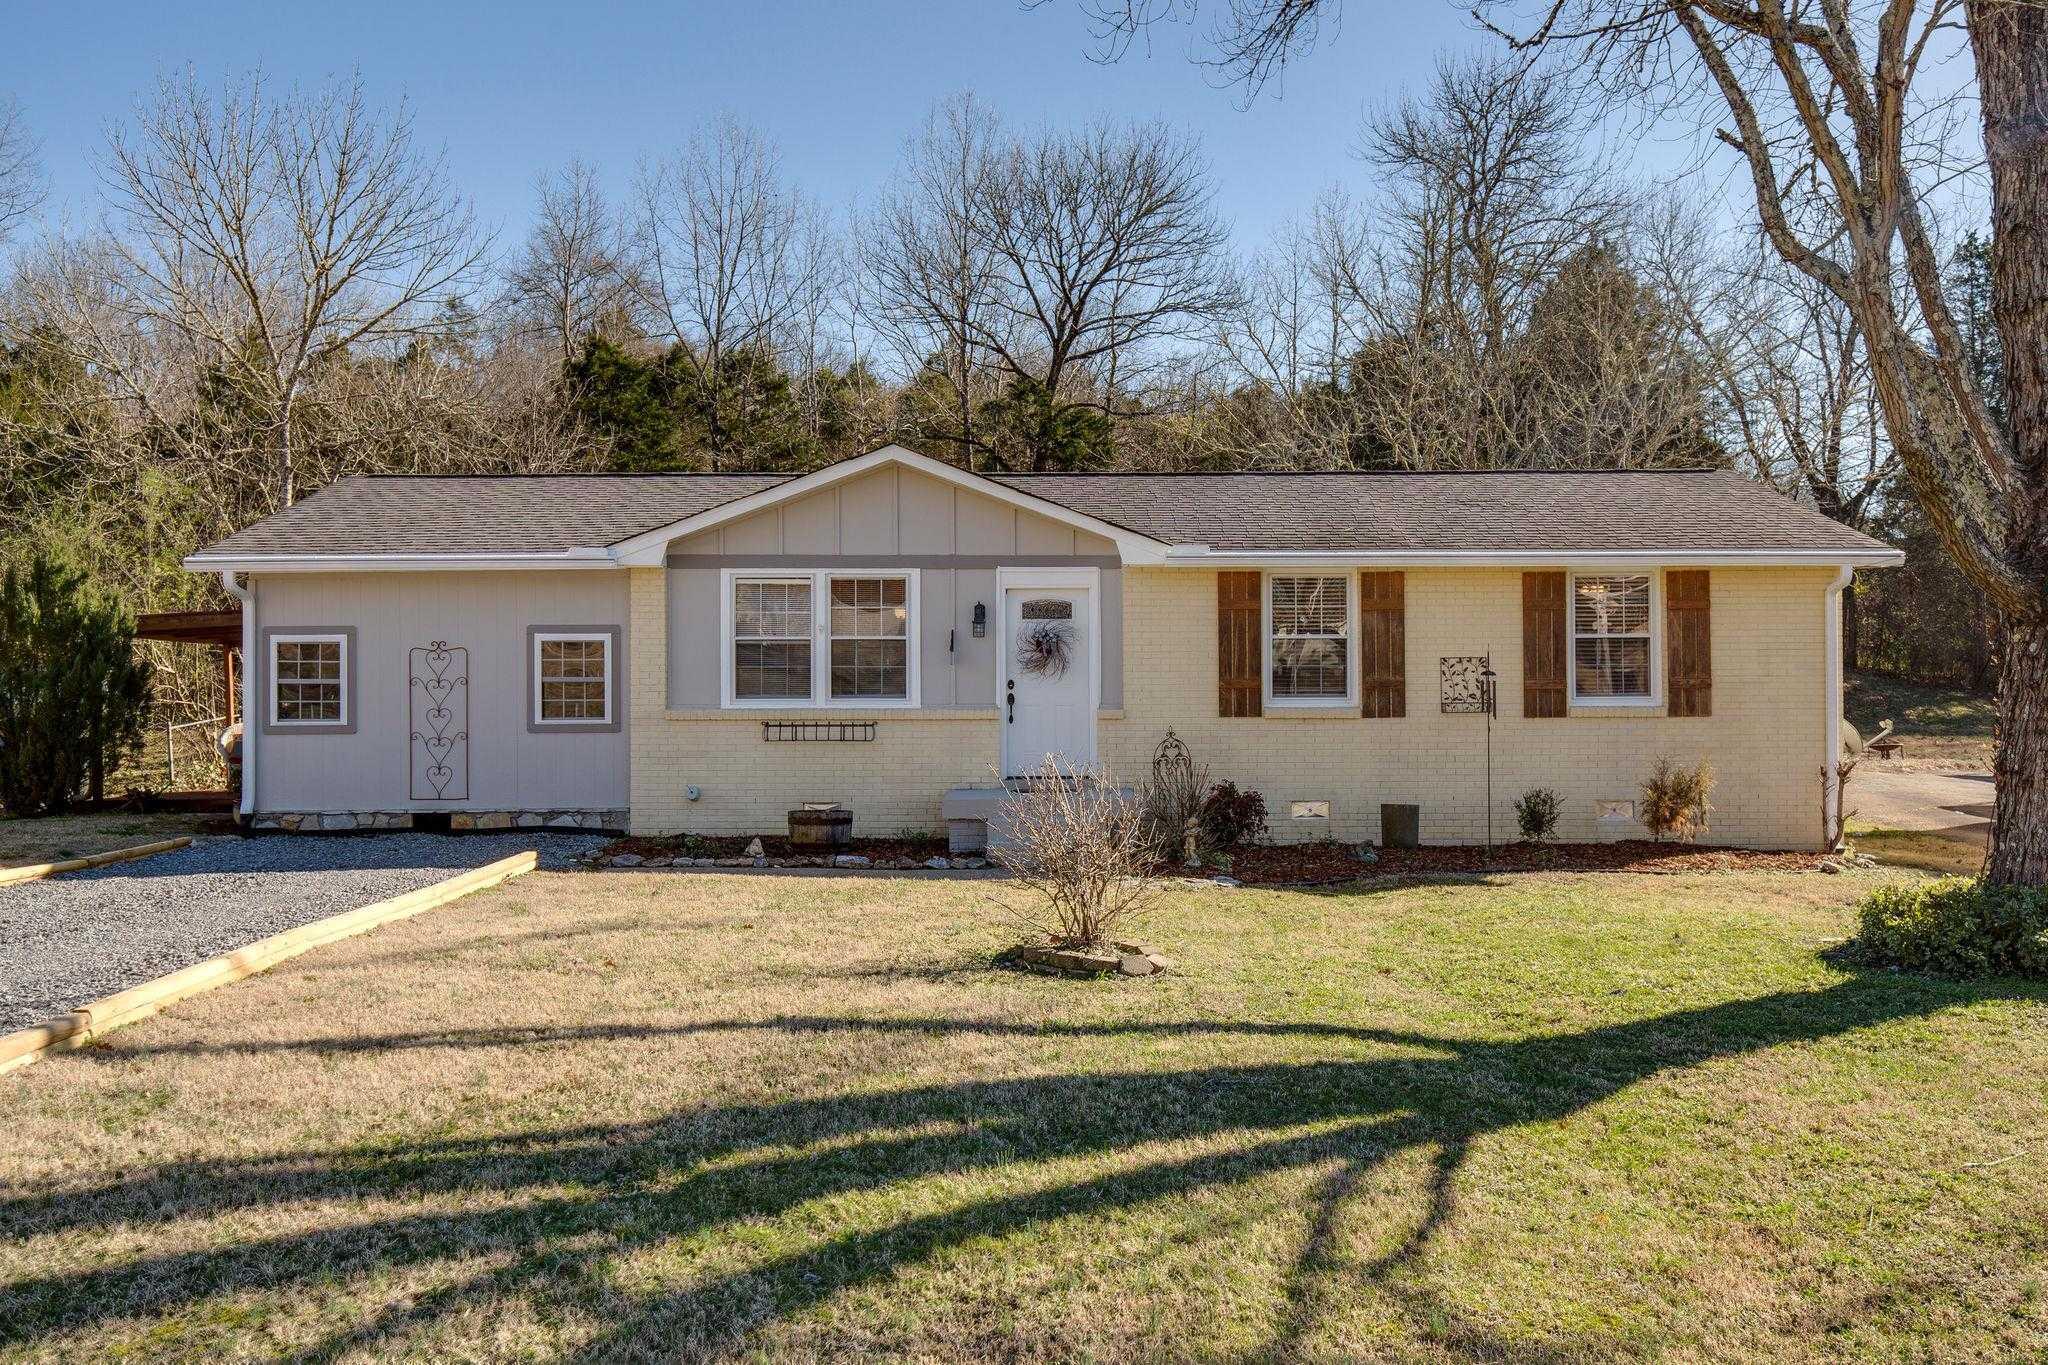 $194,900 - 3Br/1Ba -  for Sale in Twin Valley Sec 3, Hendersonville